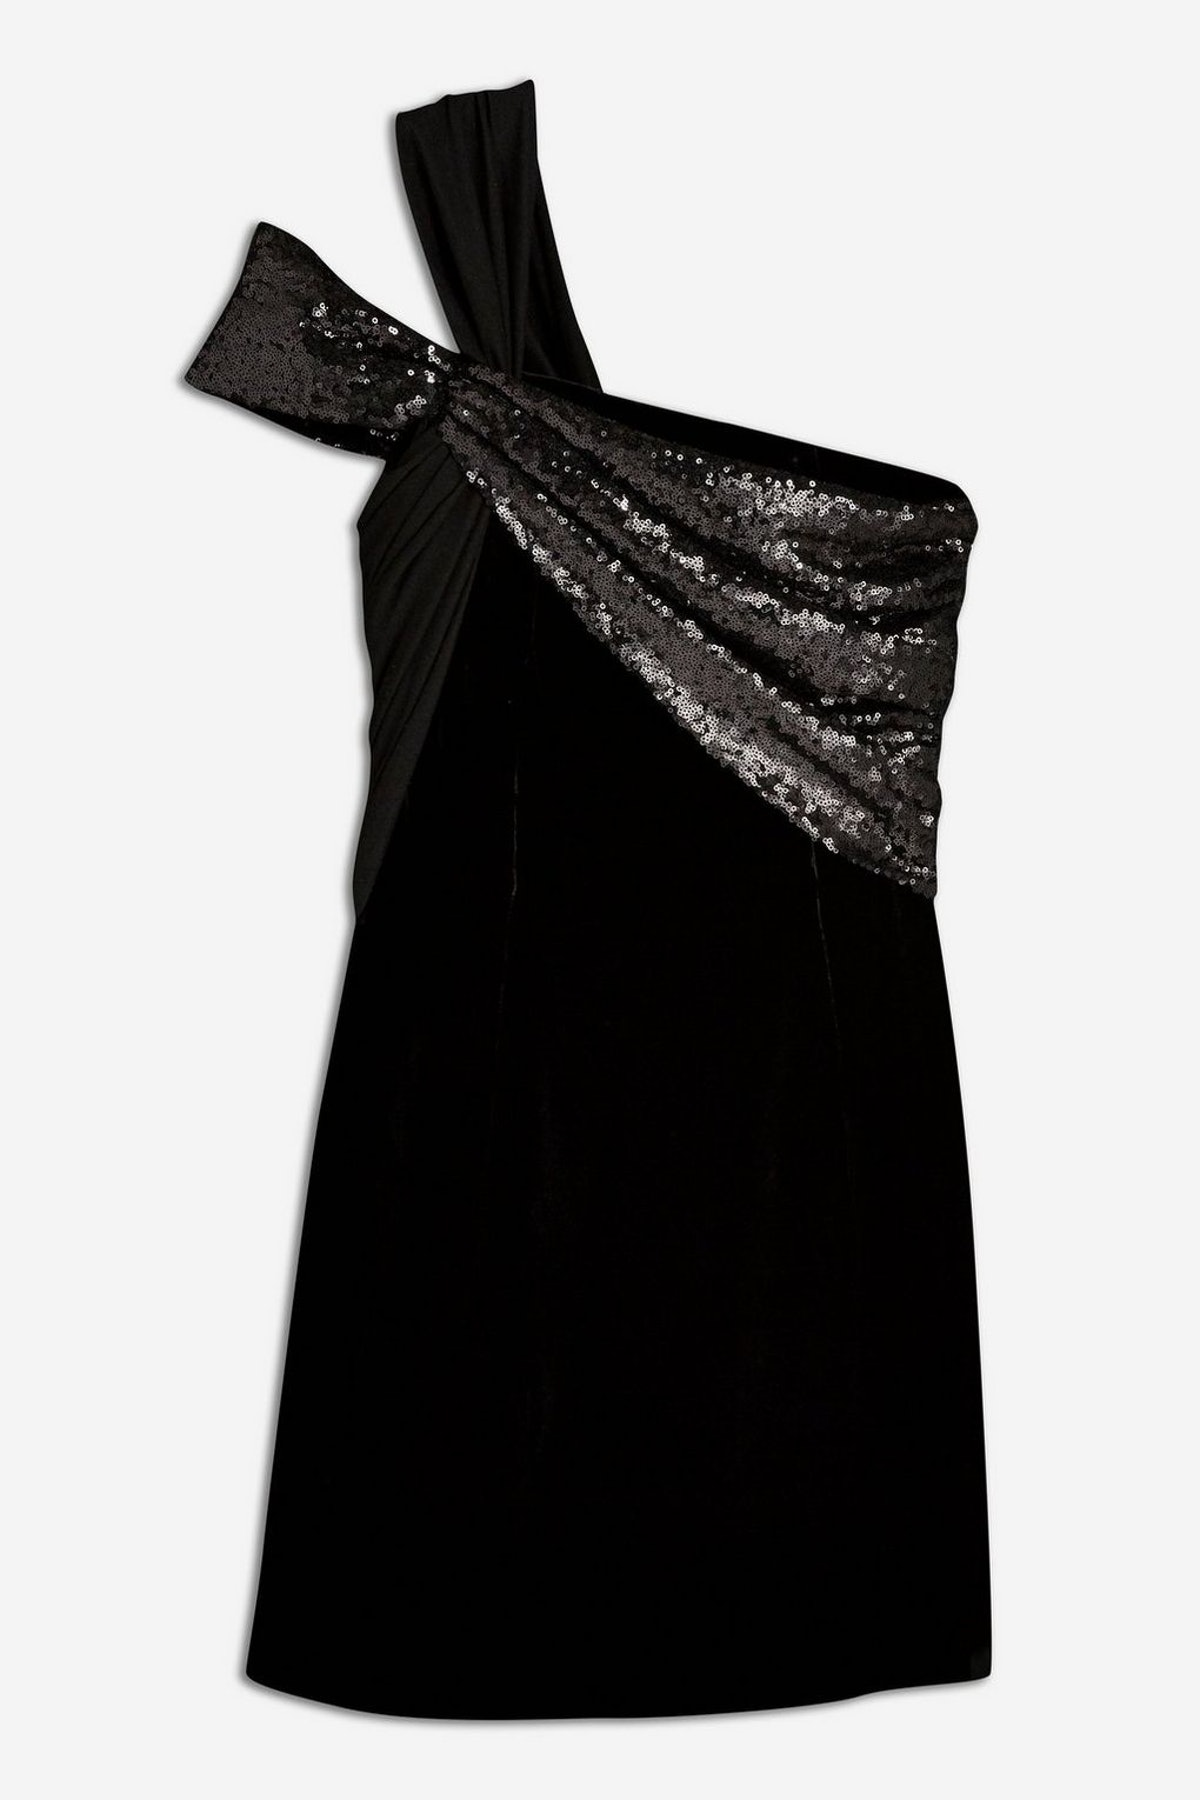 Velvet and Sequin Dress by Topshop x Halpern